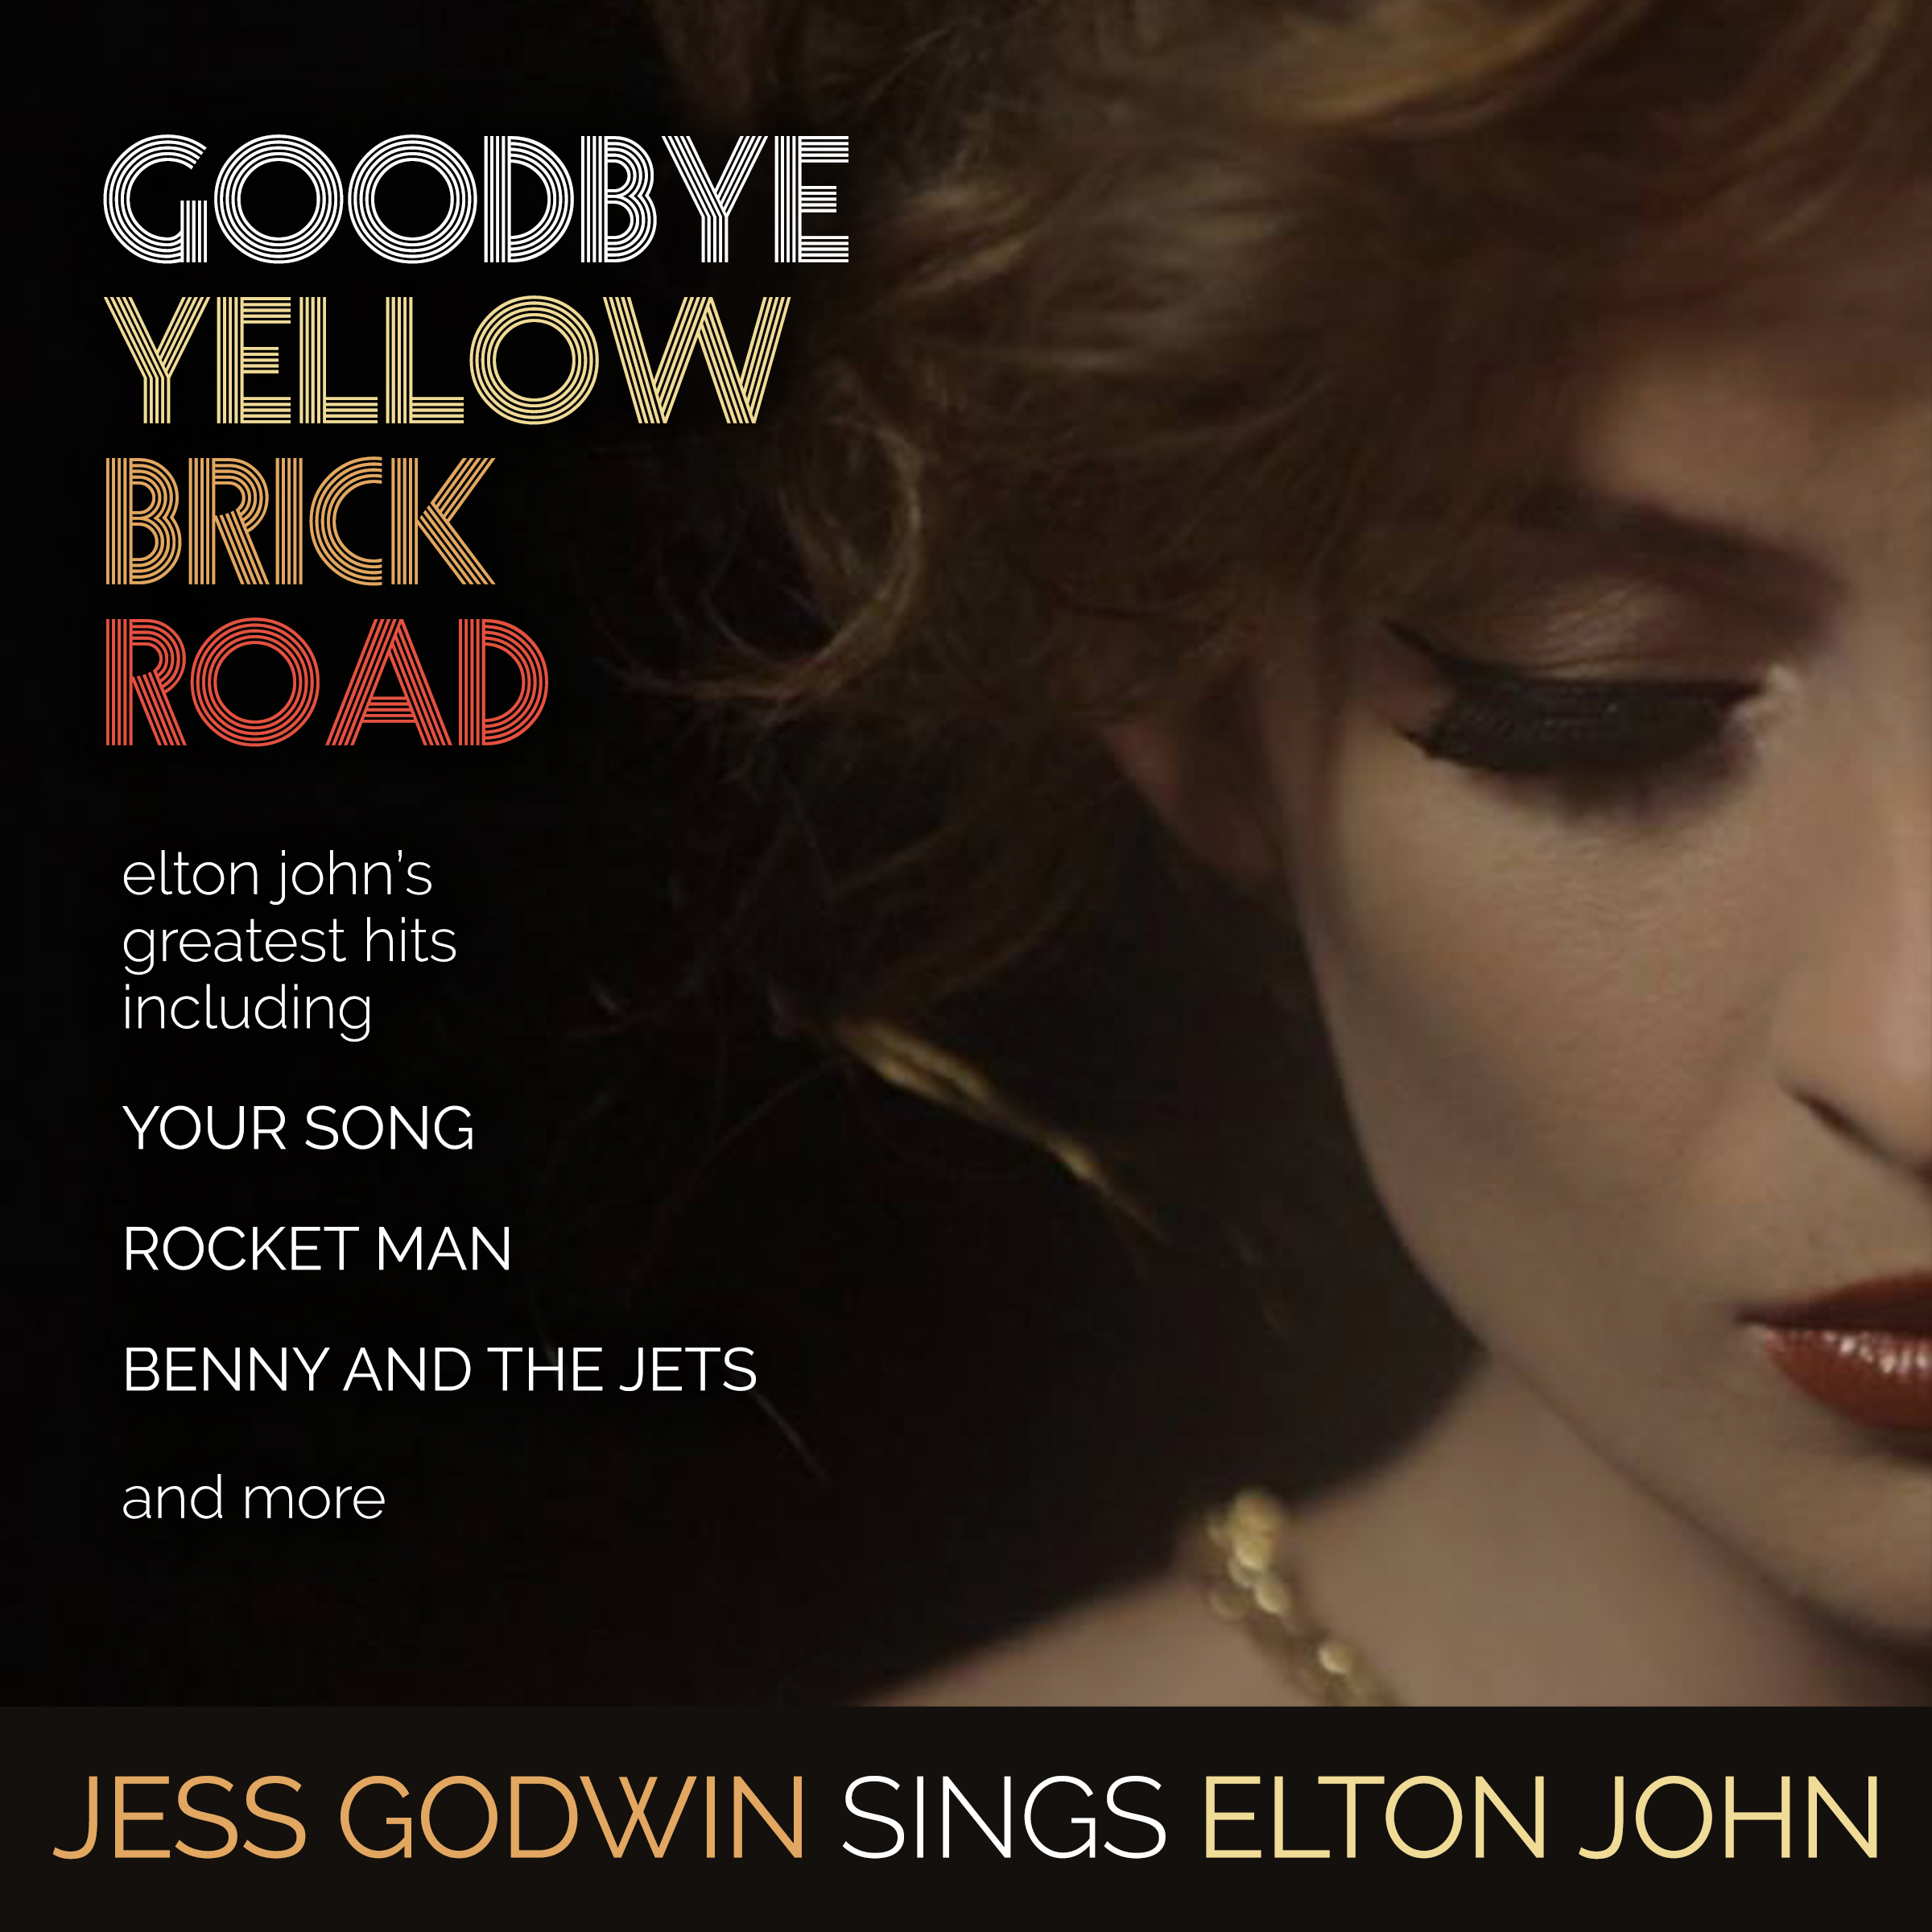 Goodbye Yellow Brick Road: Jess Godwin Sings Elton John